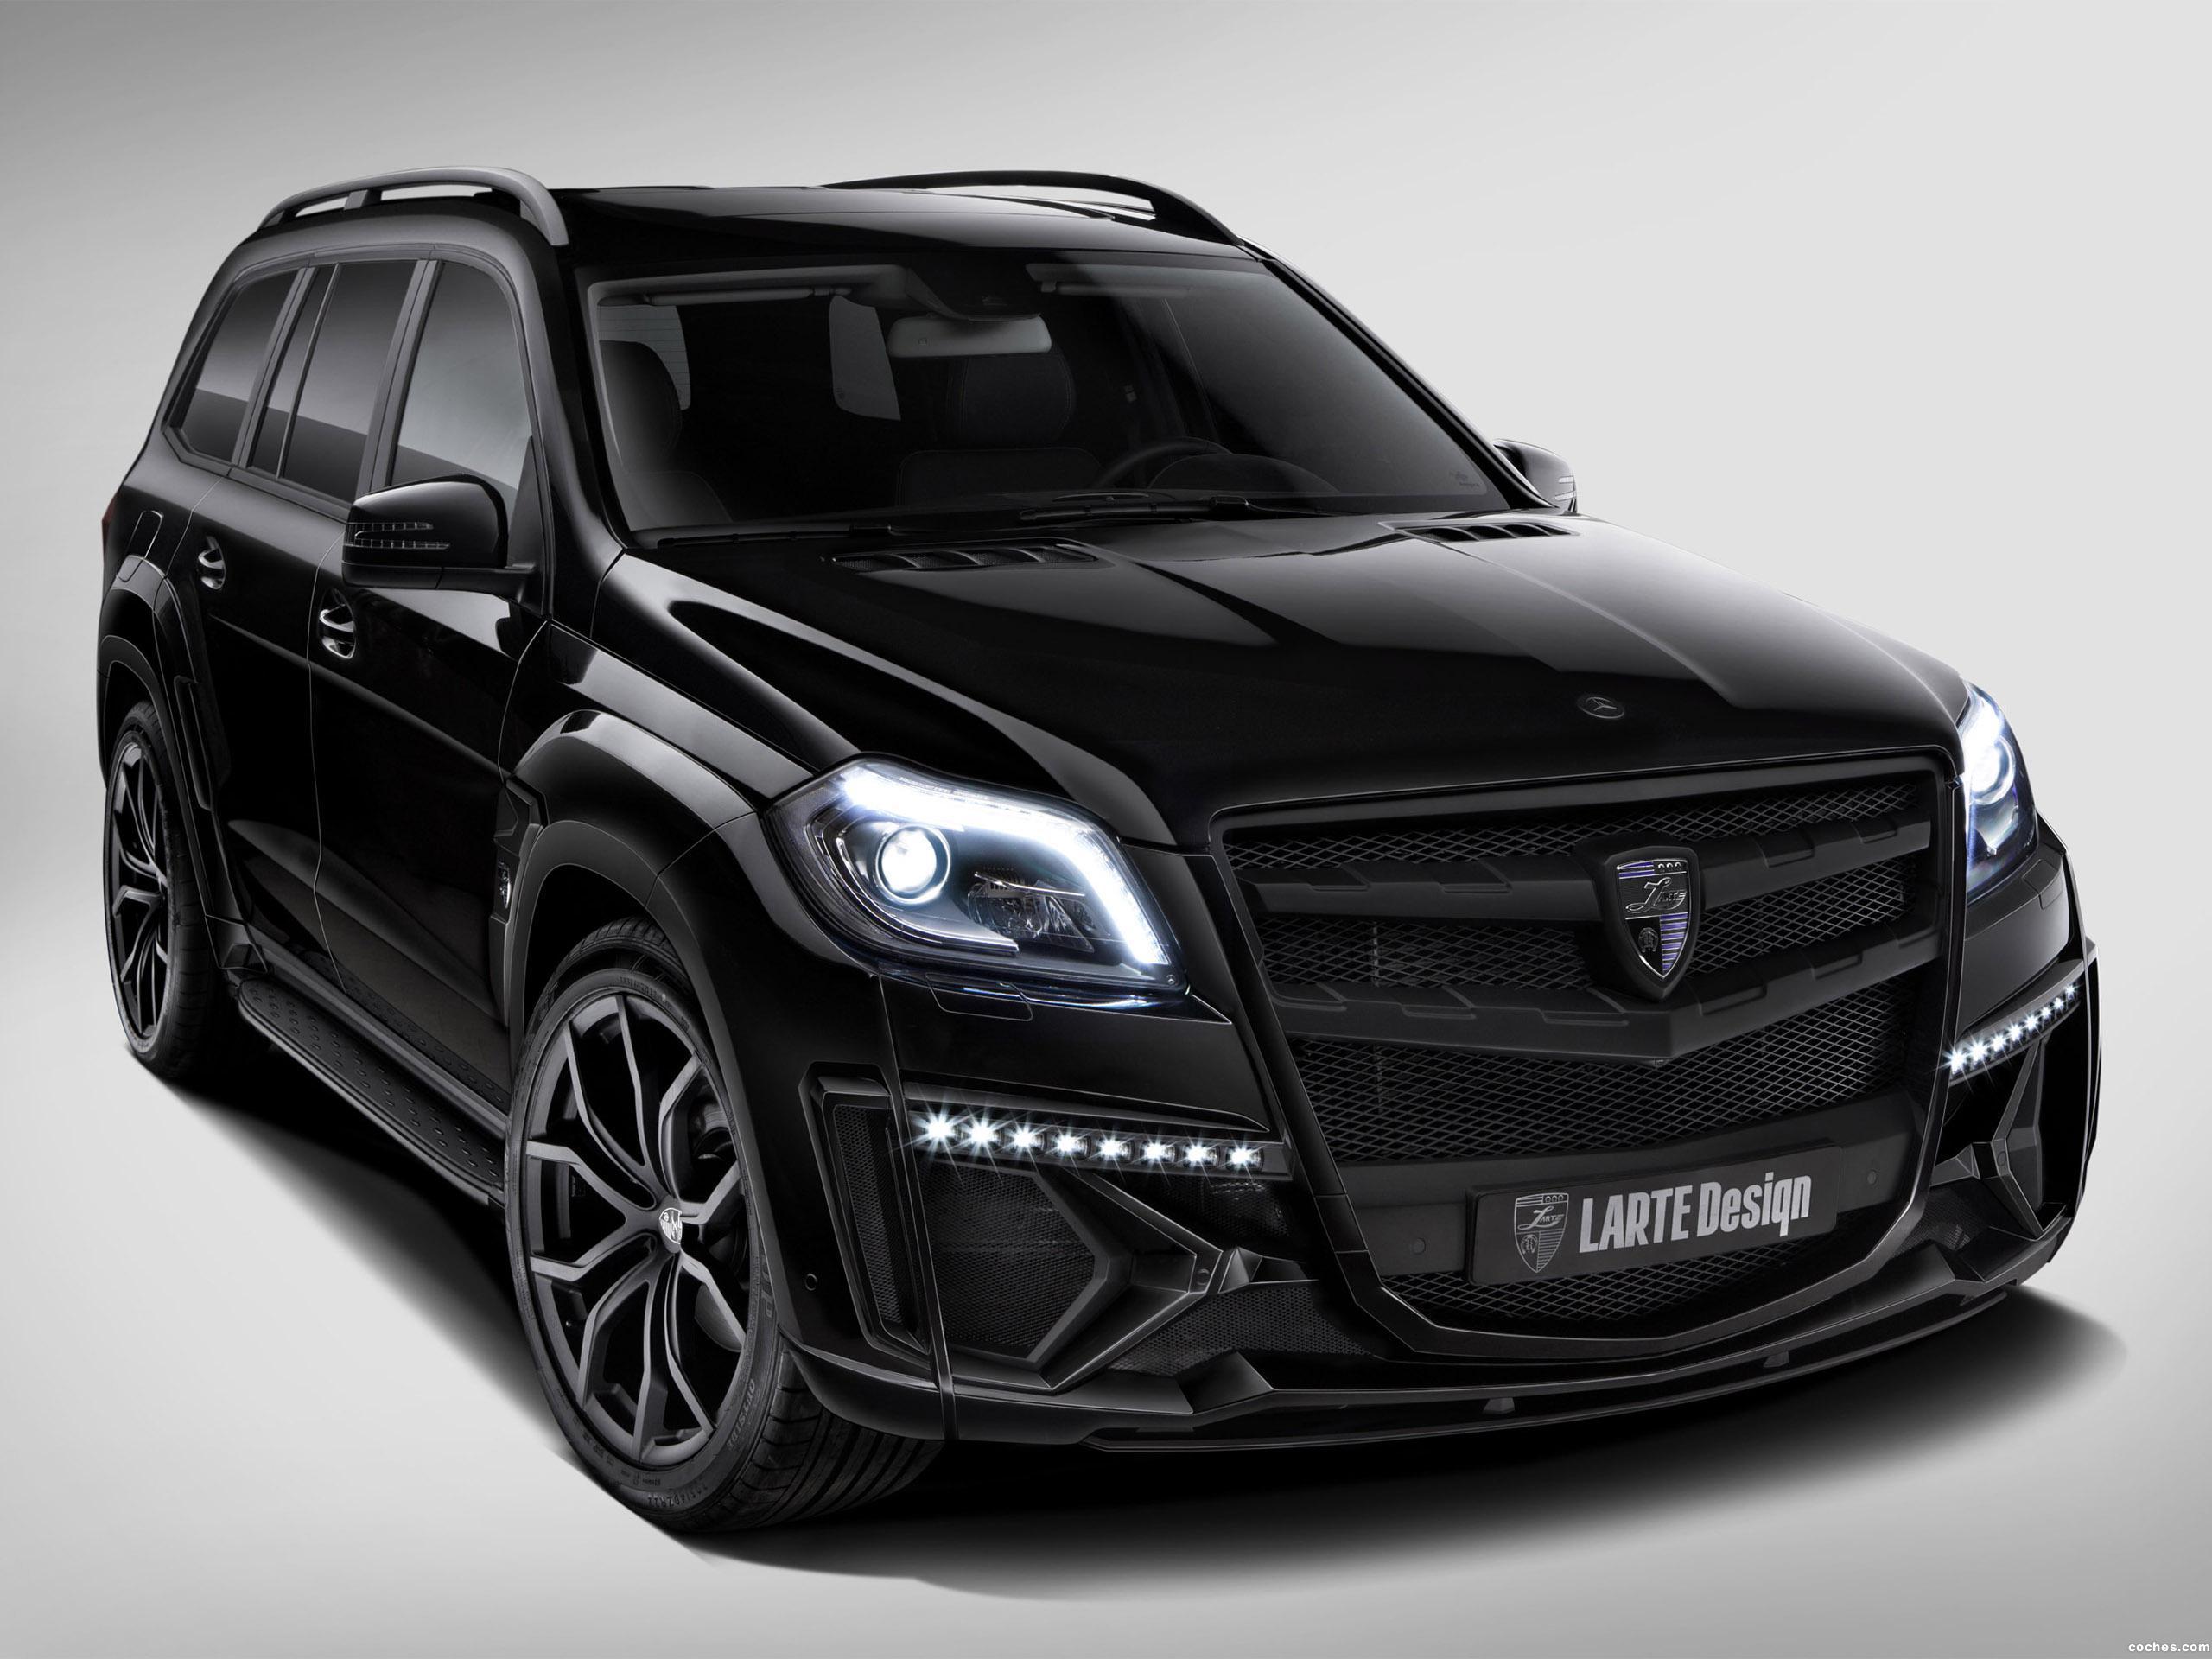 Foto 0 de Mercedes Clase GL Black Crystal Larte Design 2014